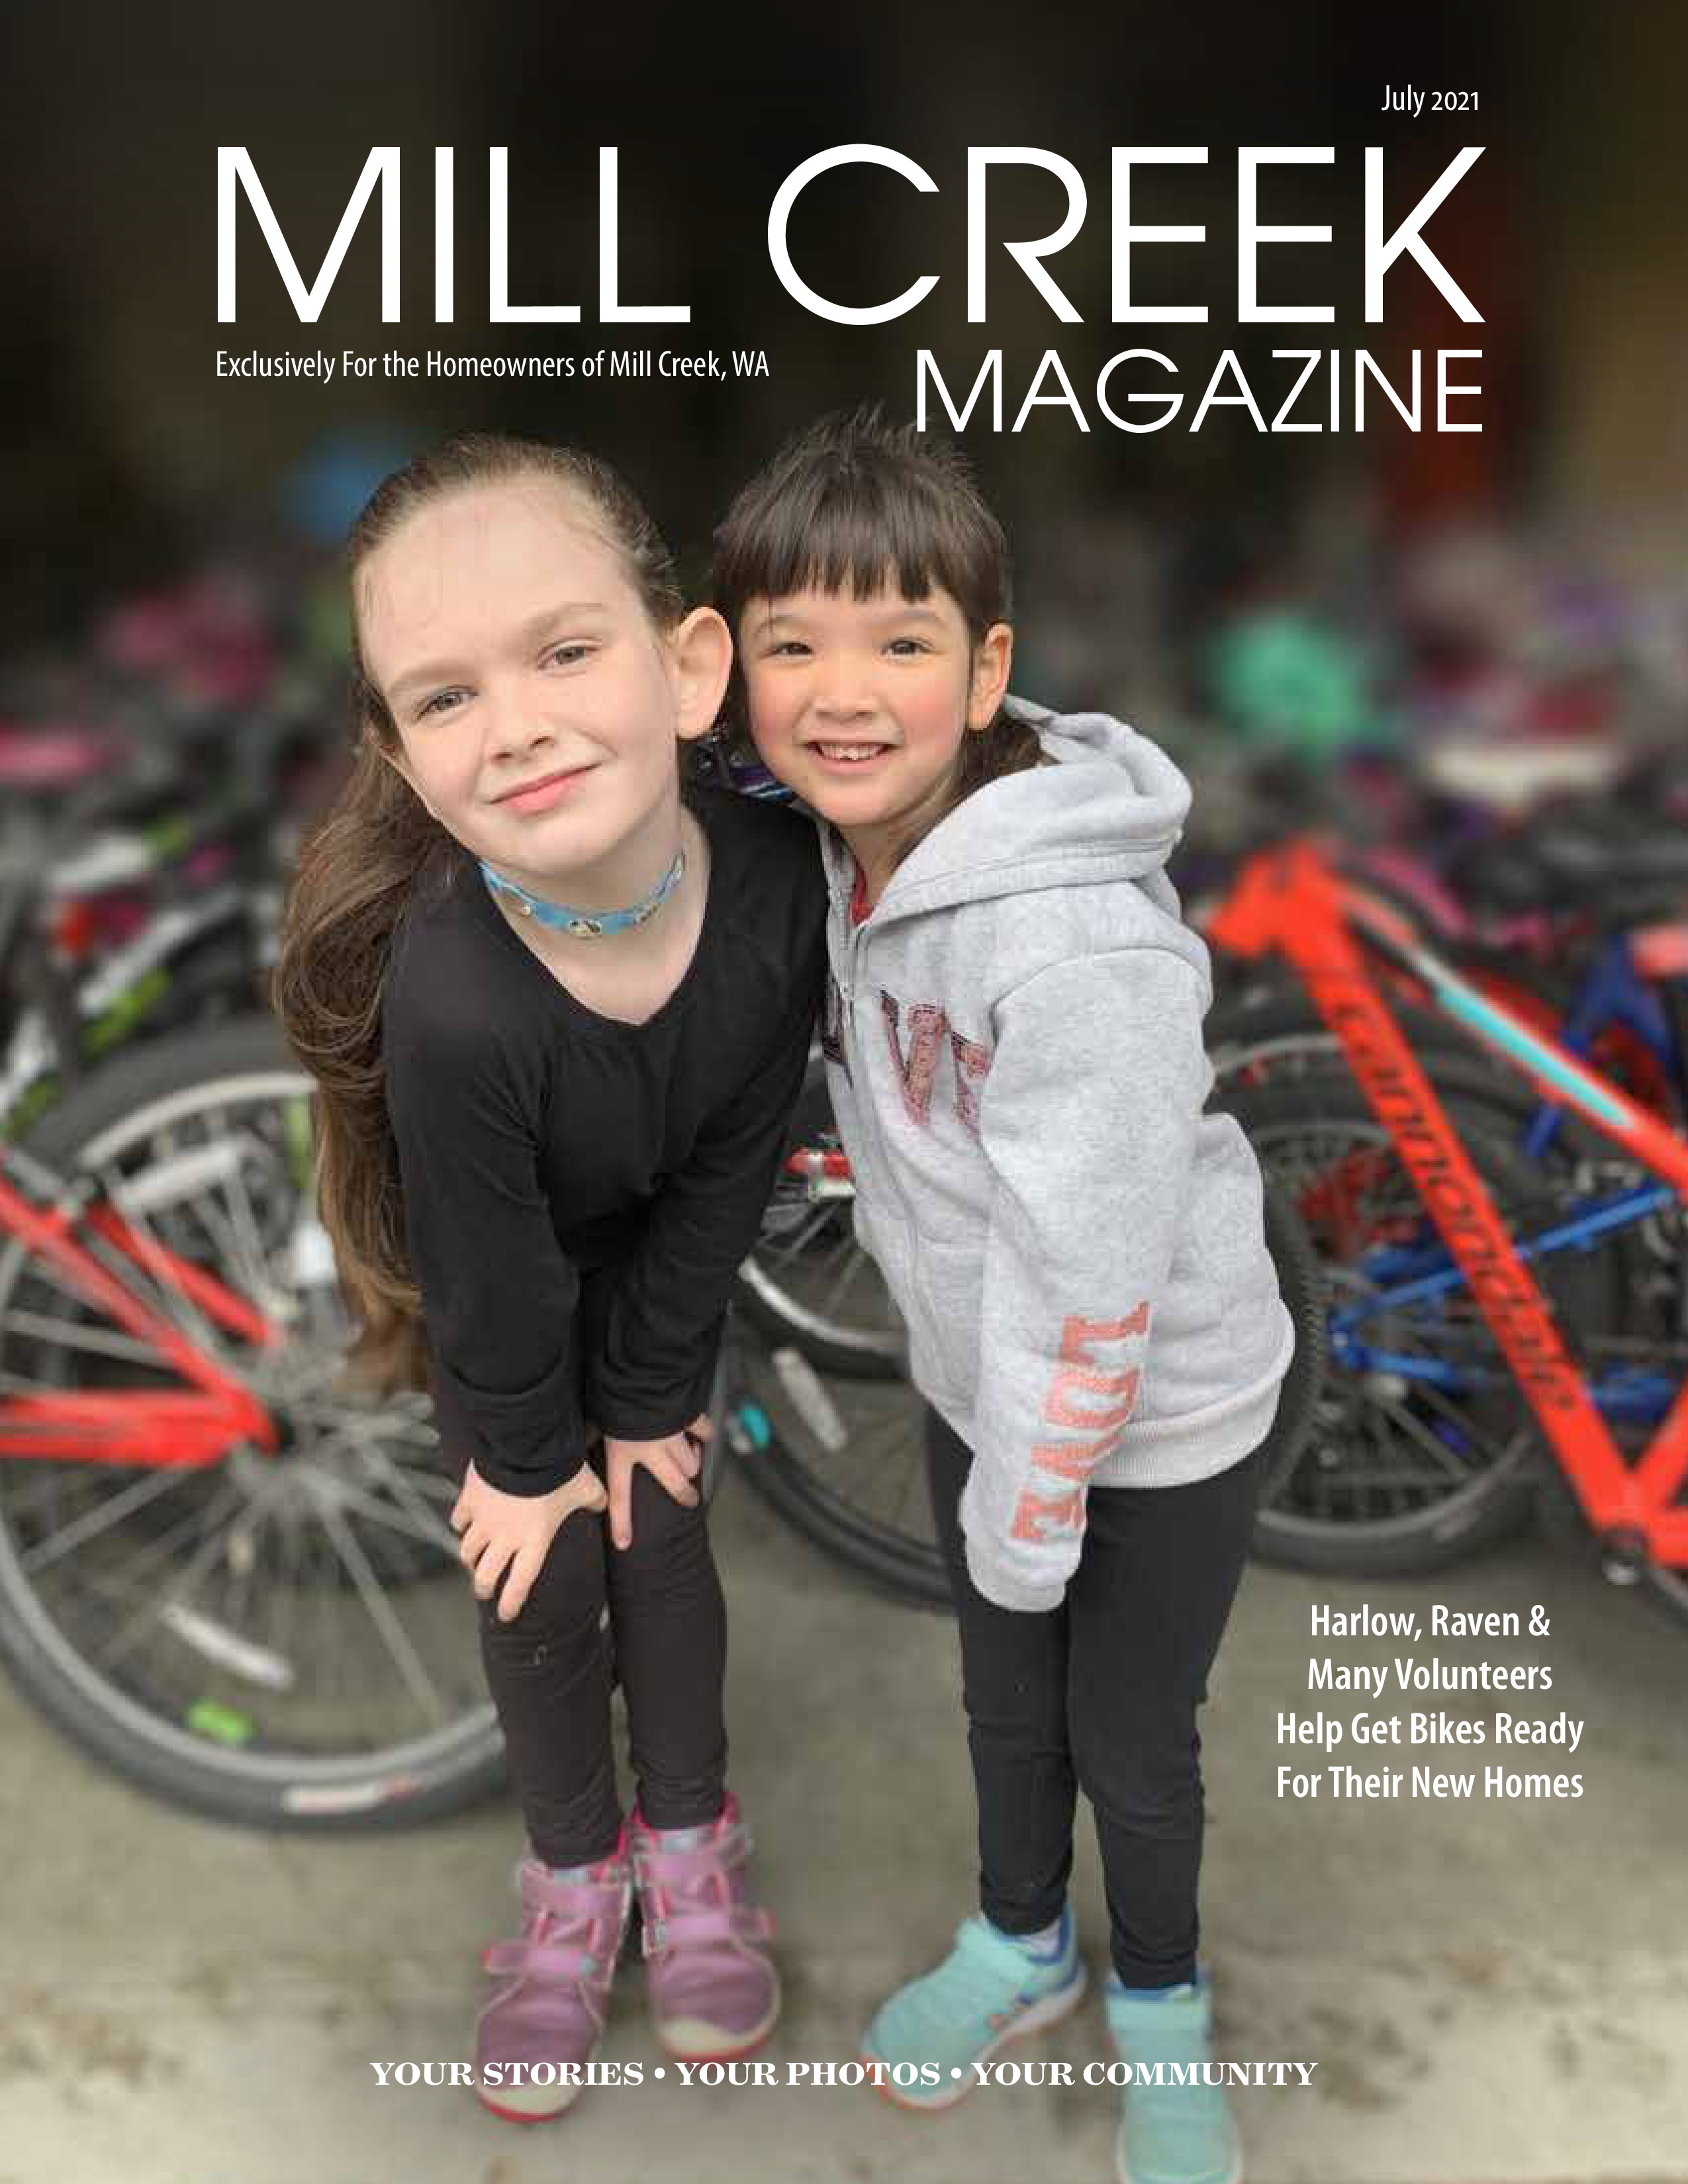 Mill Creek Magazine 2021-07-01